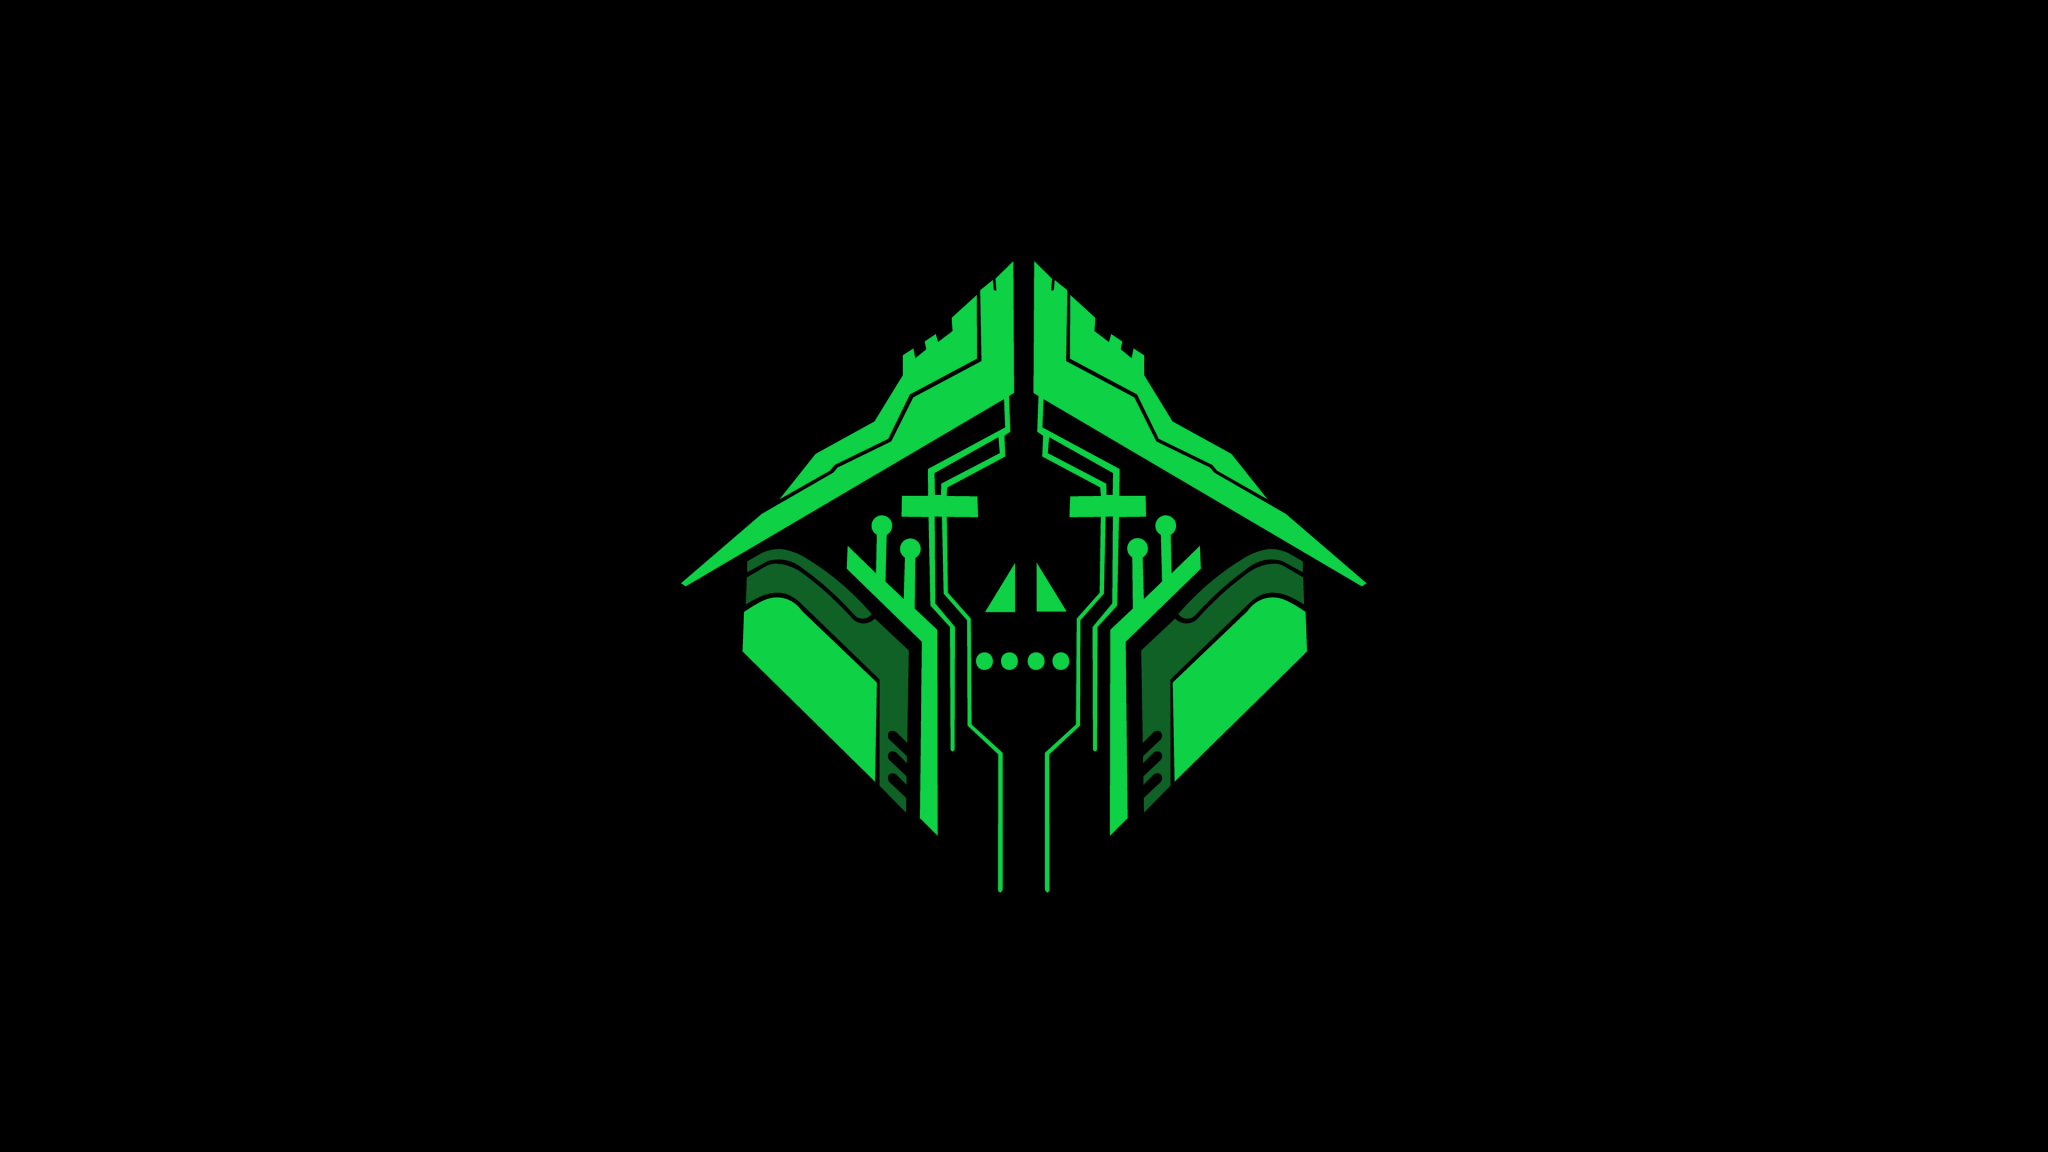 2048x1152 Crypto Apex Legends 4K Logo 2048x1152 Resolution ...